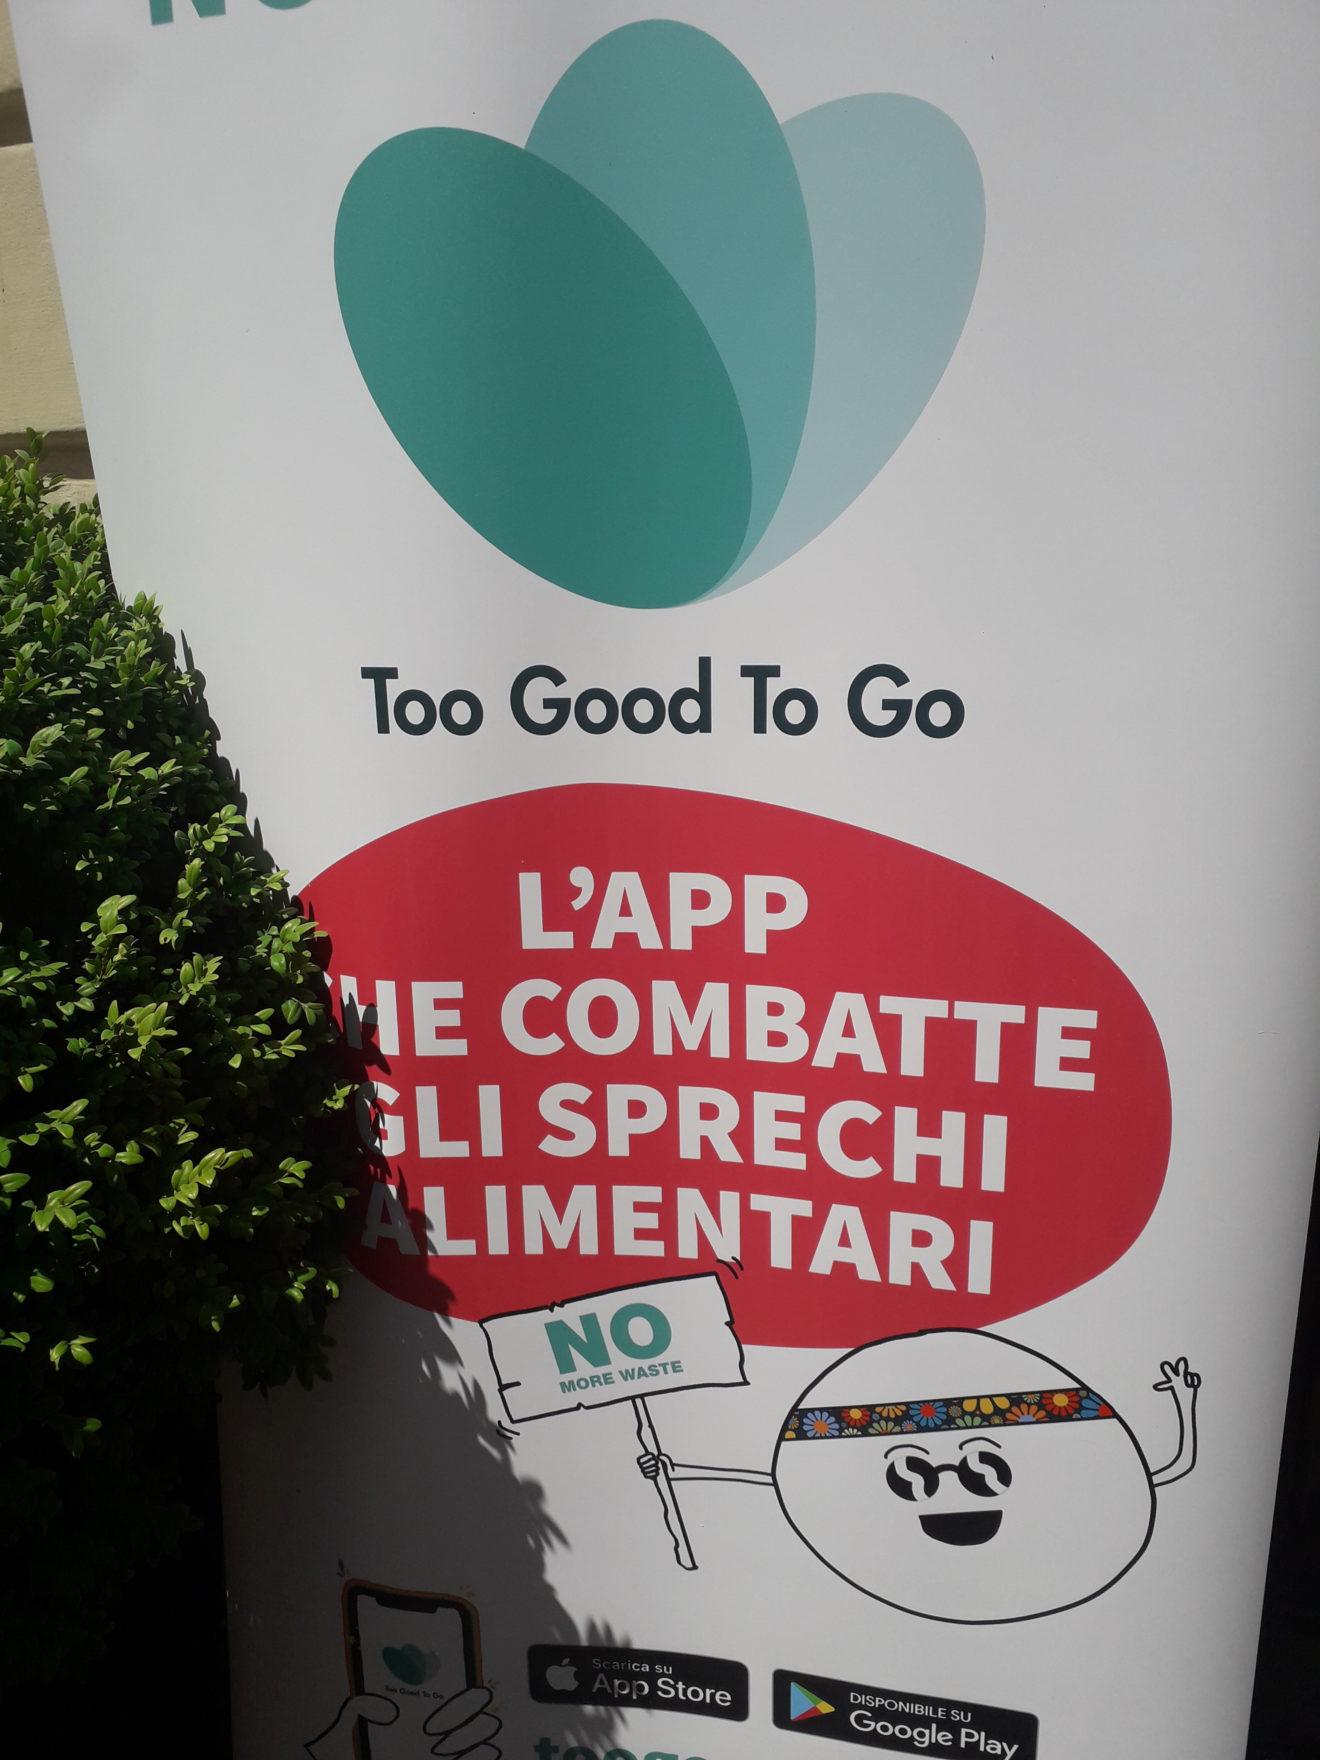 Spreco alimentare: l'app Too Good To Go arriva a Torino